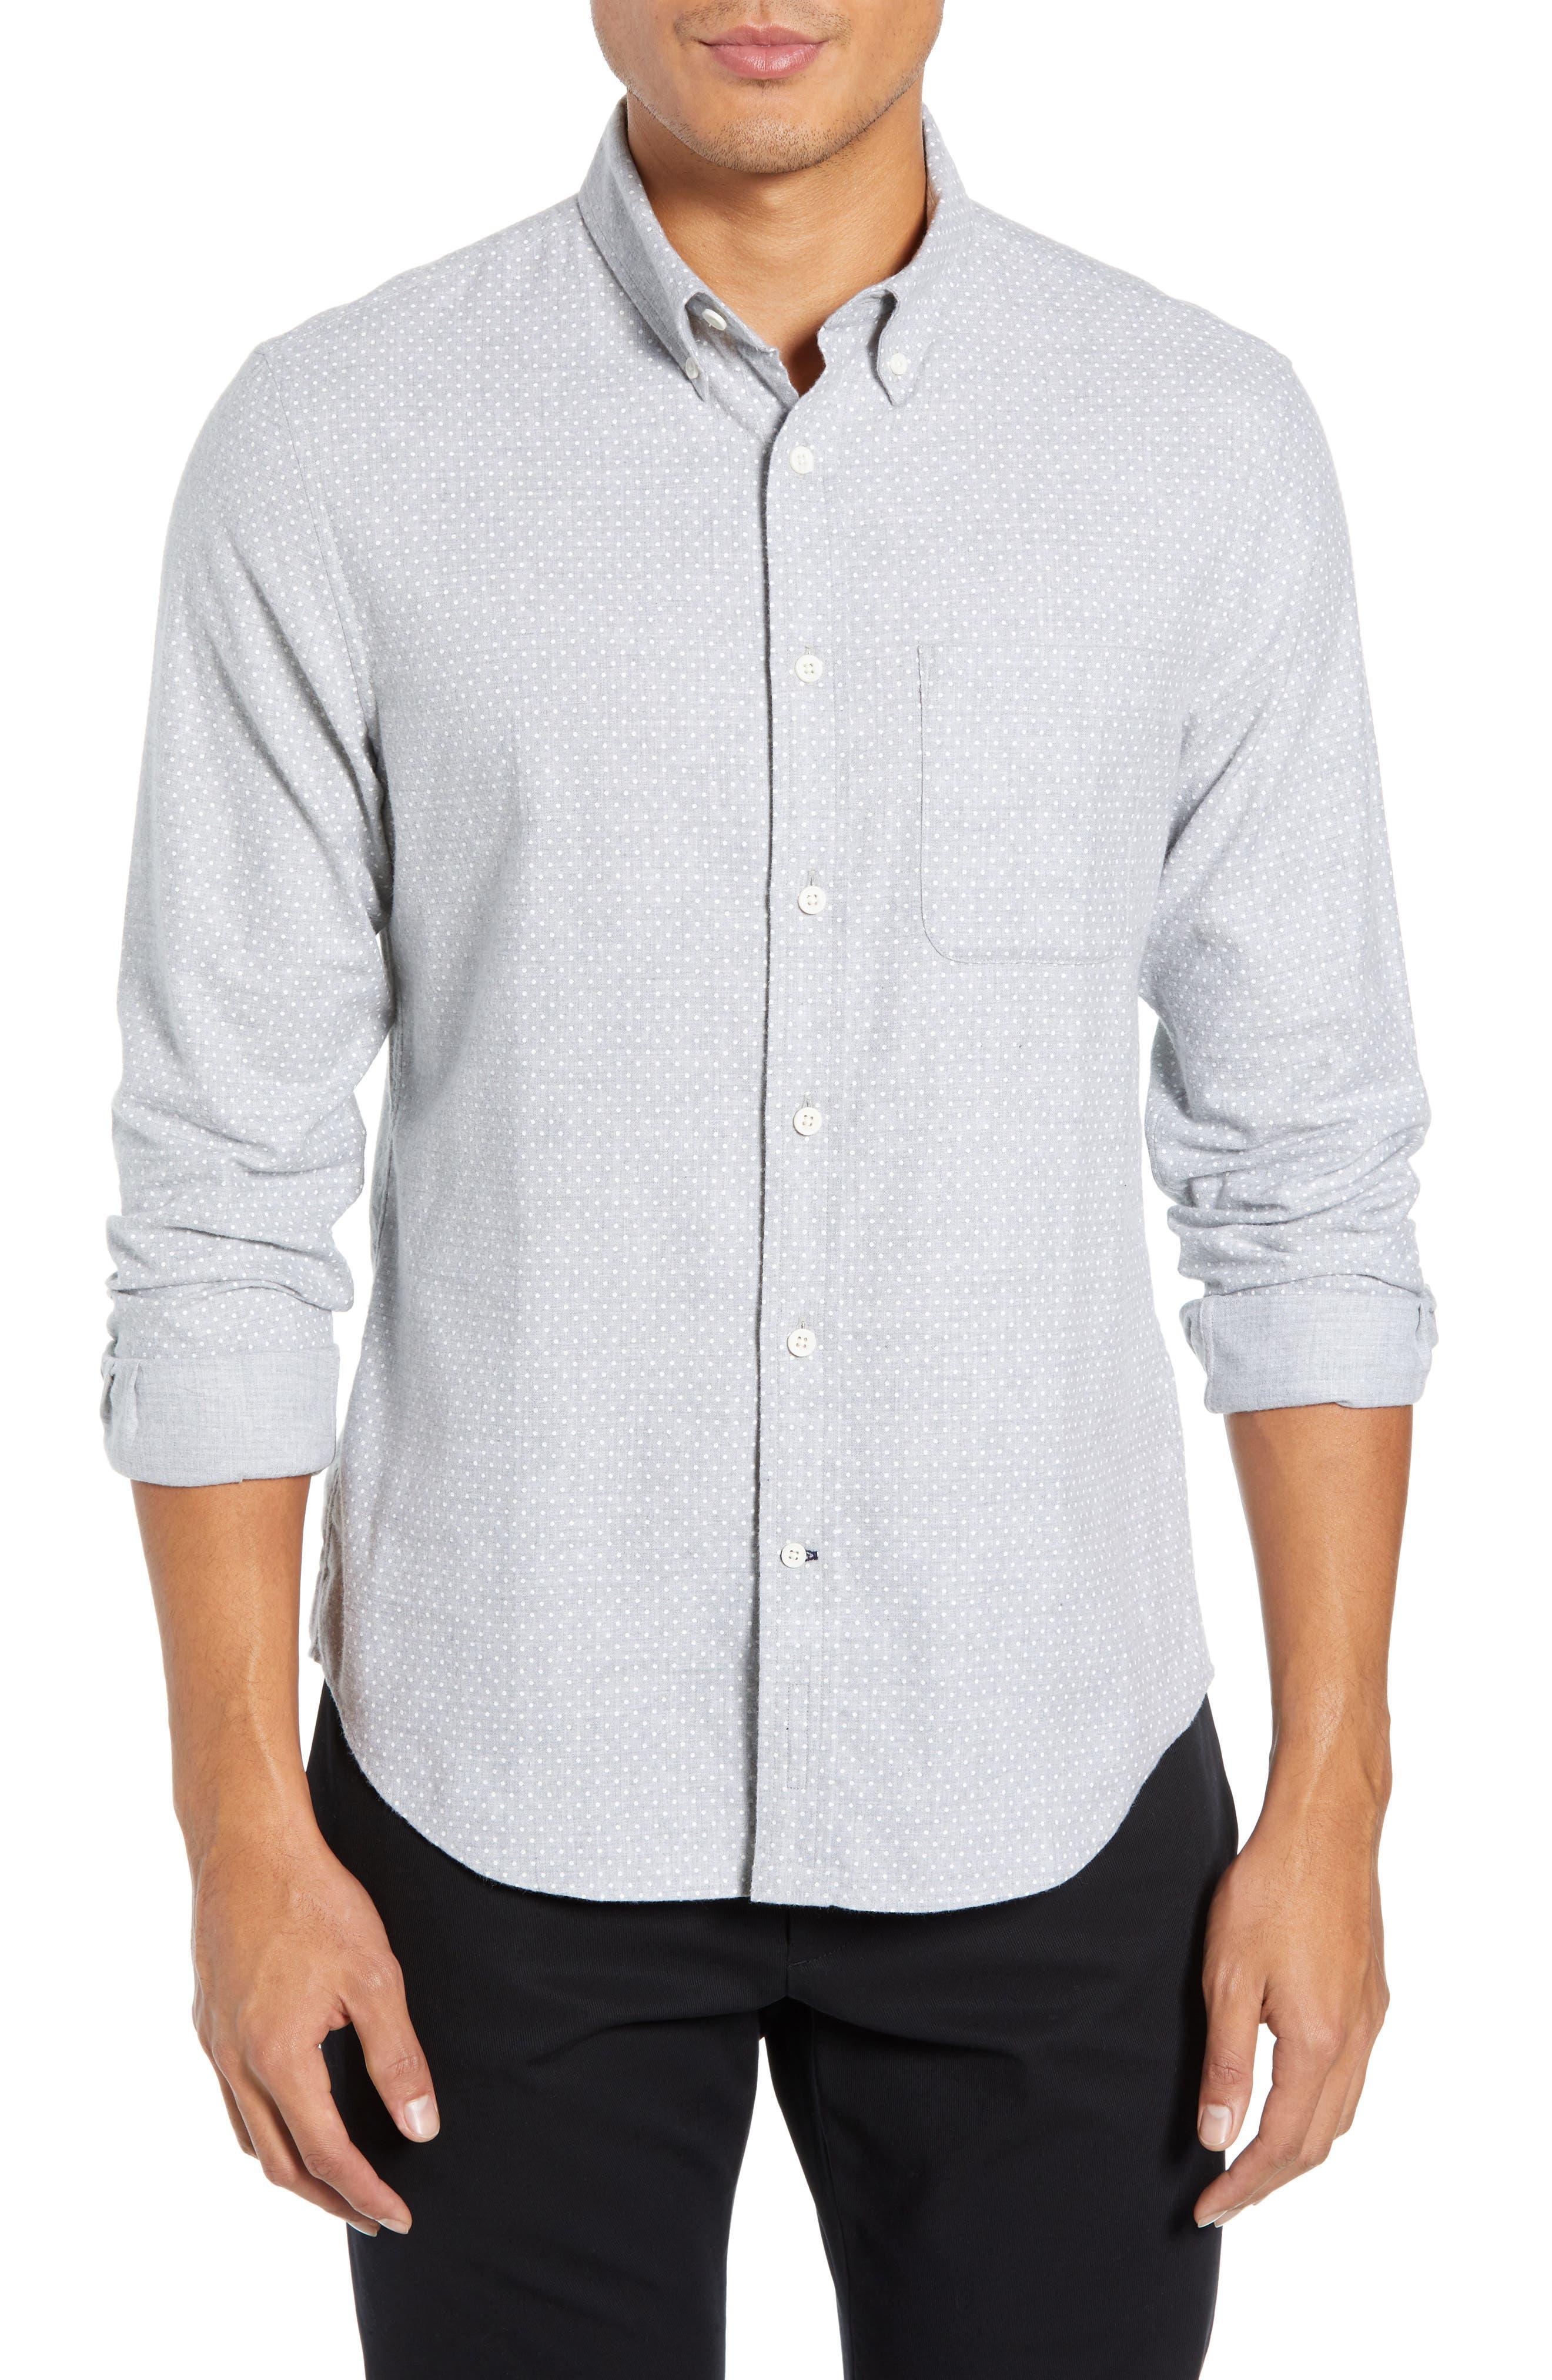 Polka Dot Cotton Flannel Sport Shirt, Main, color, 030